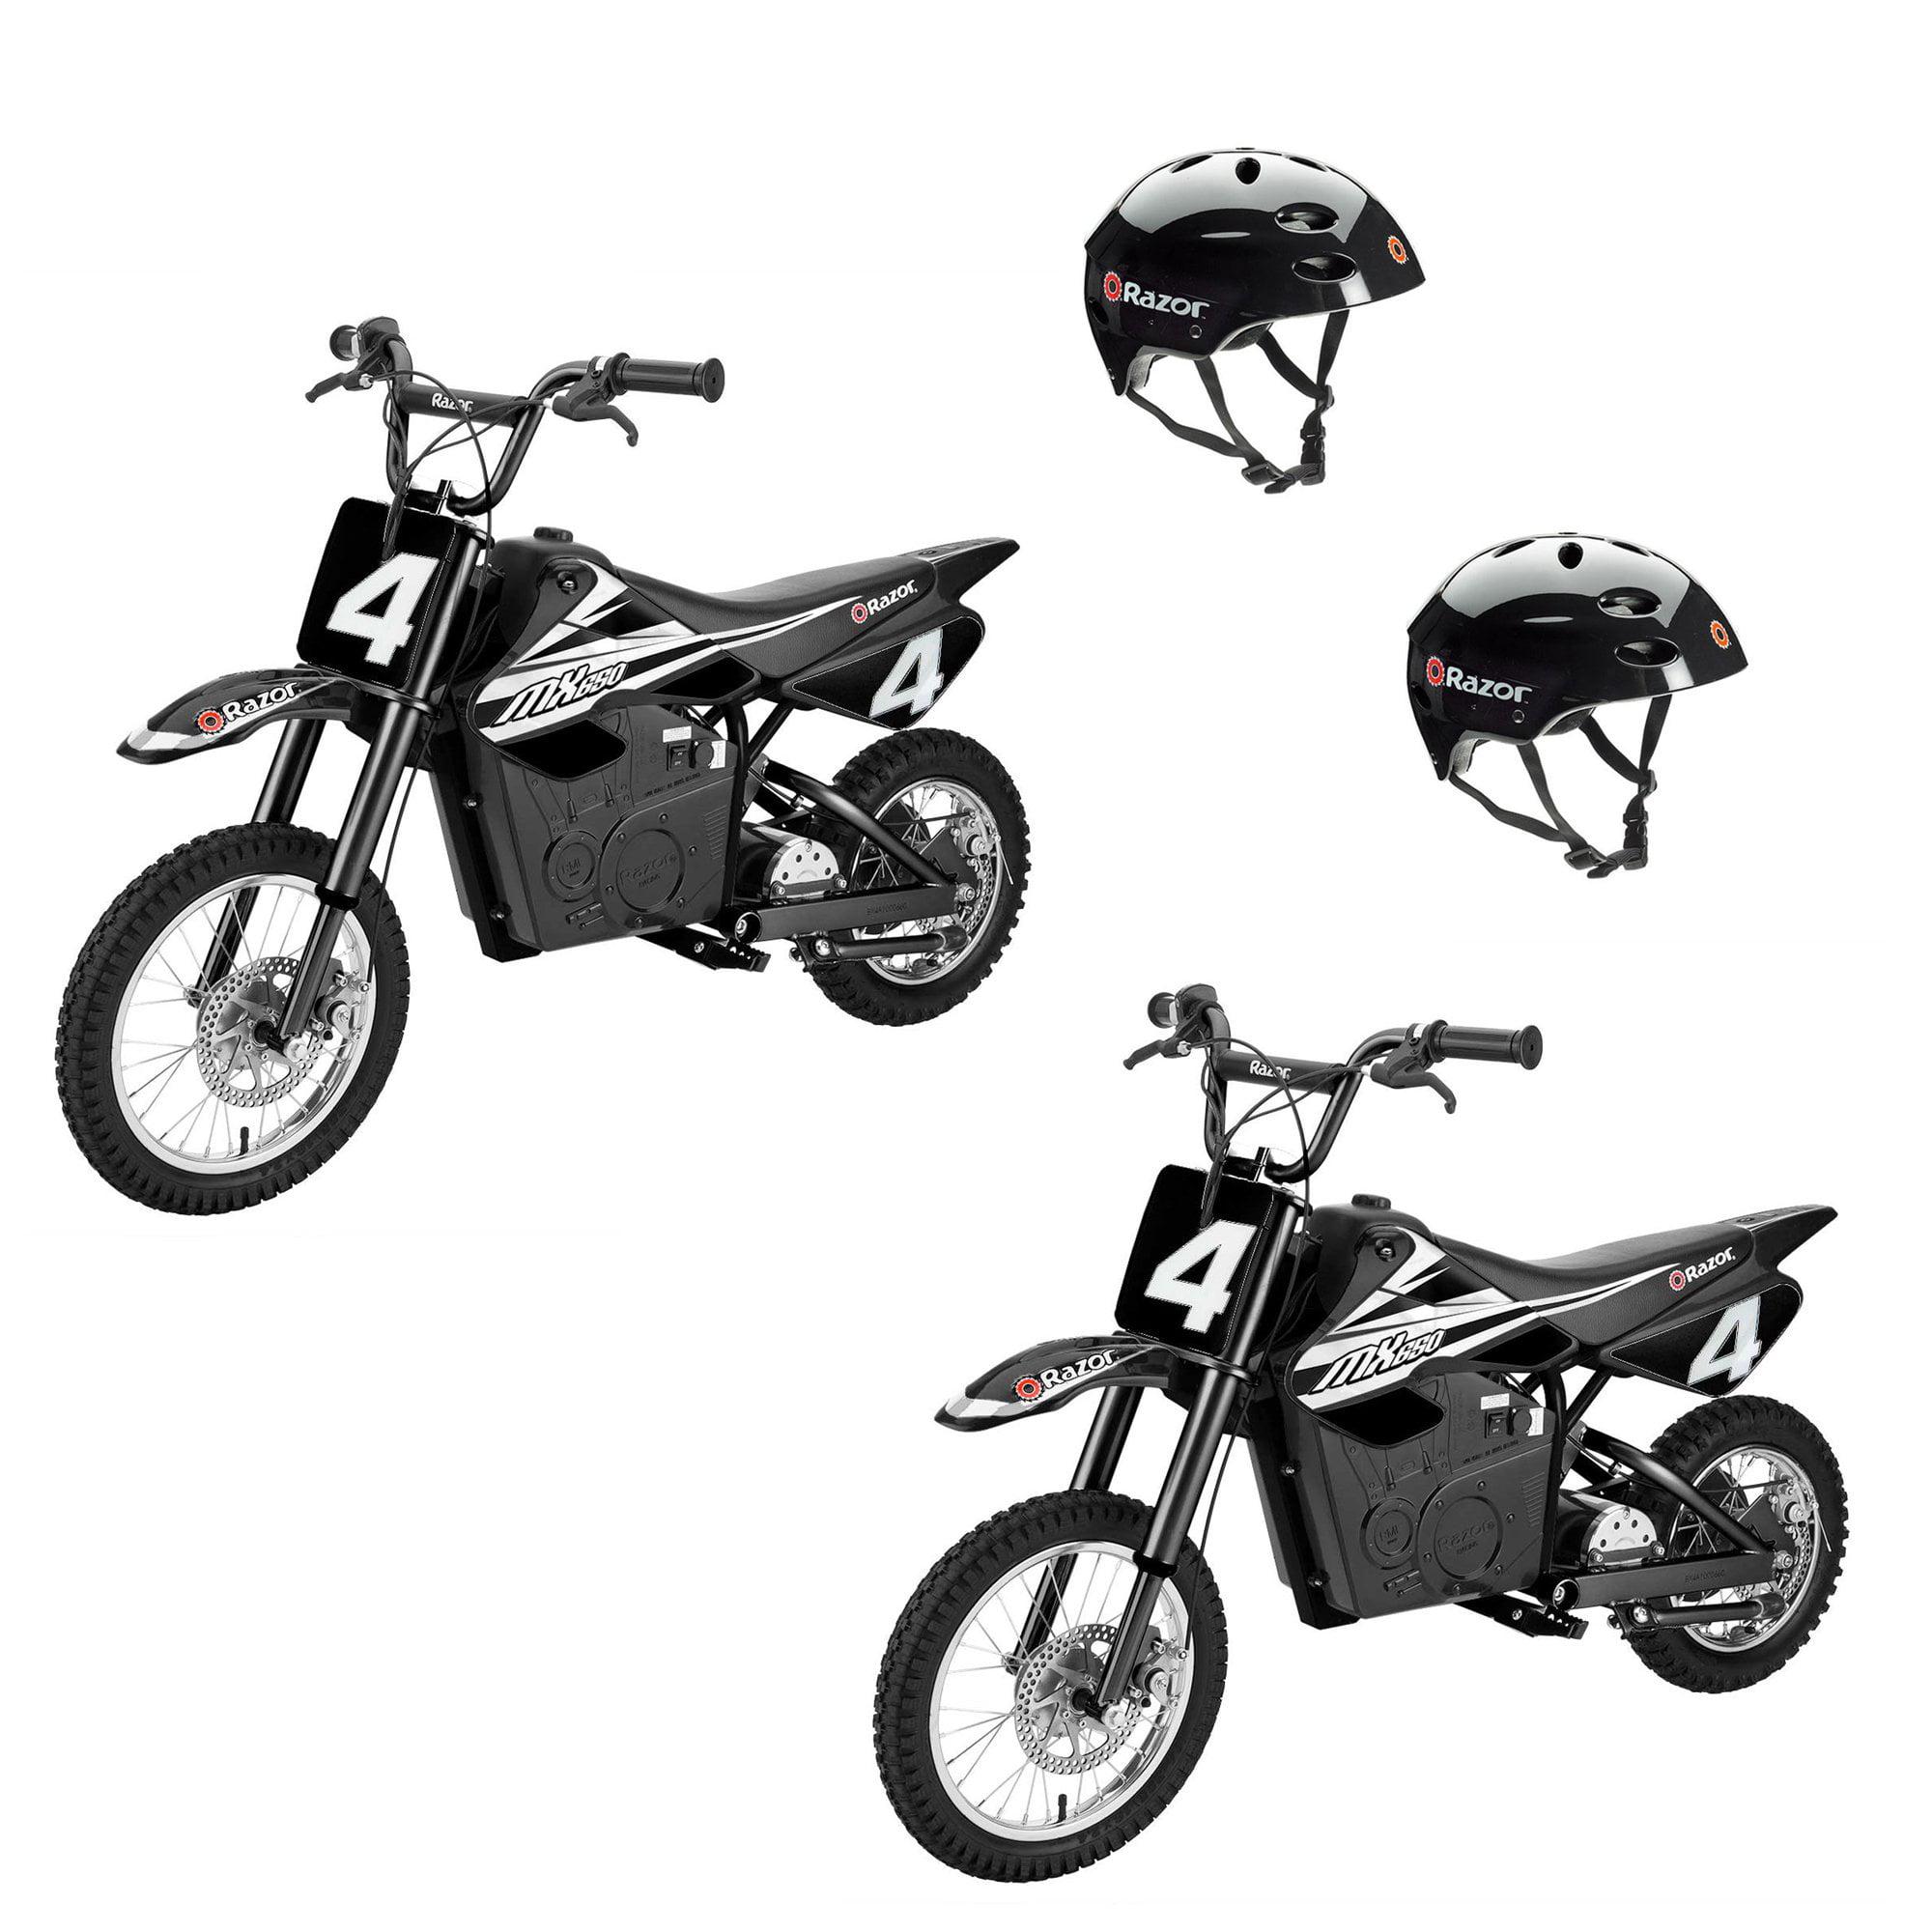 Razor MX650 Electric Dirt Rocket Motor Bikes for Teens 16+ (2 Pack) + Helmets